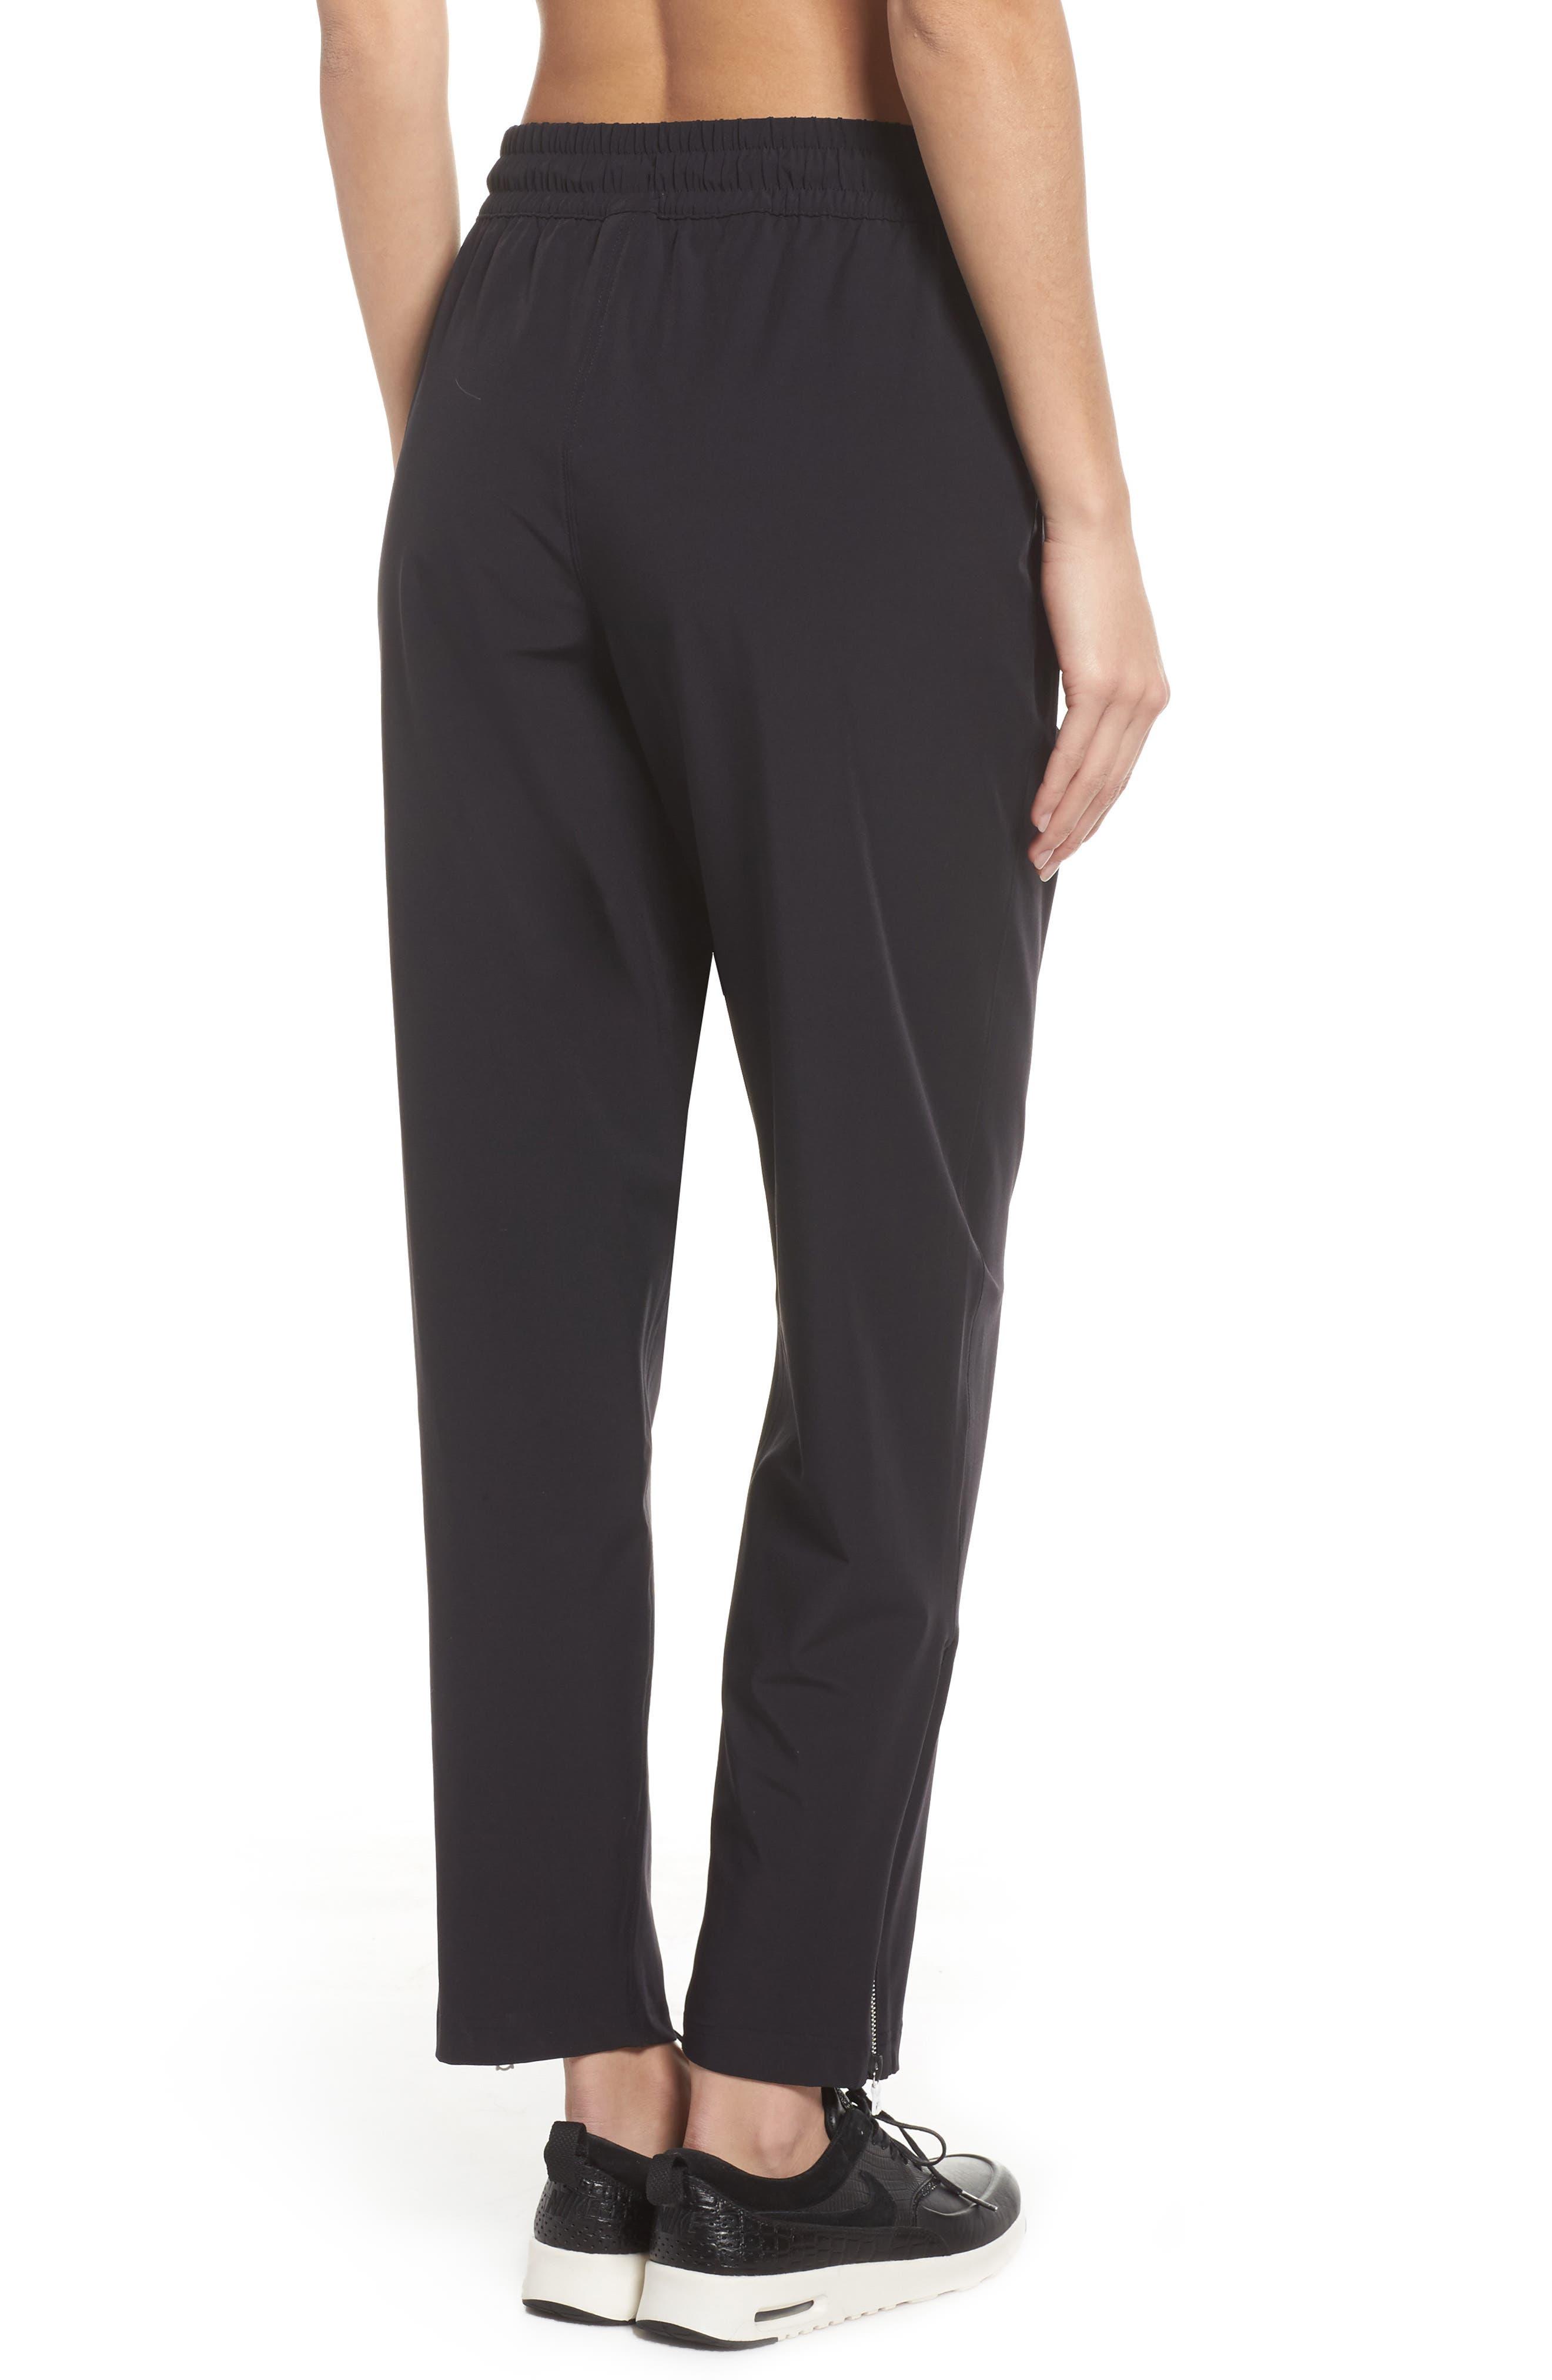 NikeLab Stretch Woven Training Pants,                             Alternate thumbnail 2, color,                             Black/ Black